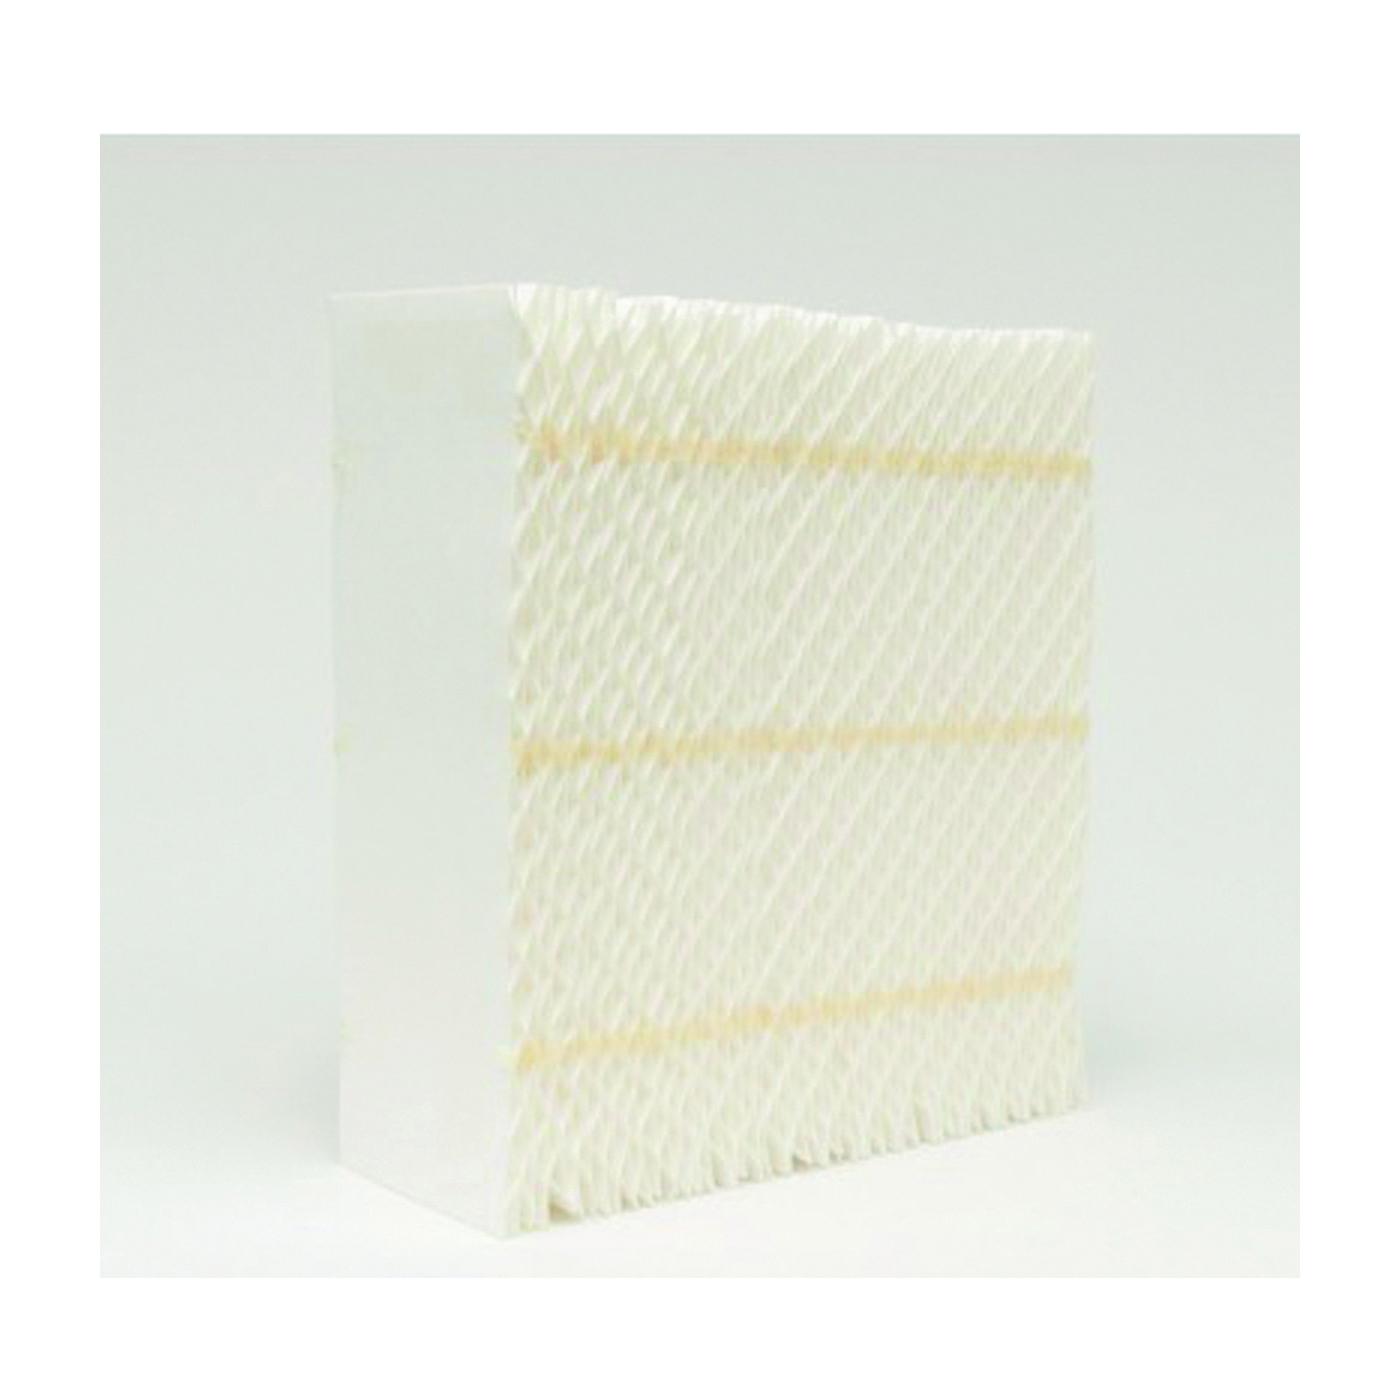 Picture of EssickAir 1043 Wick Filter, 12-1/4 in L, 4 in W, Plastic Frame, White